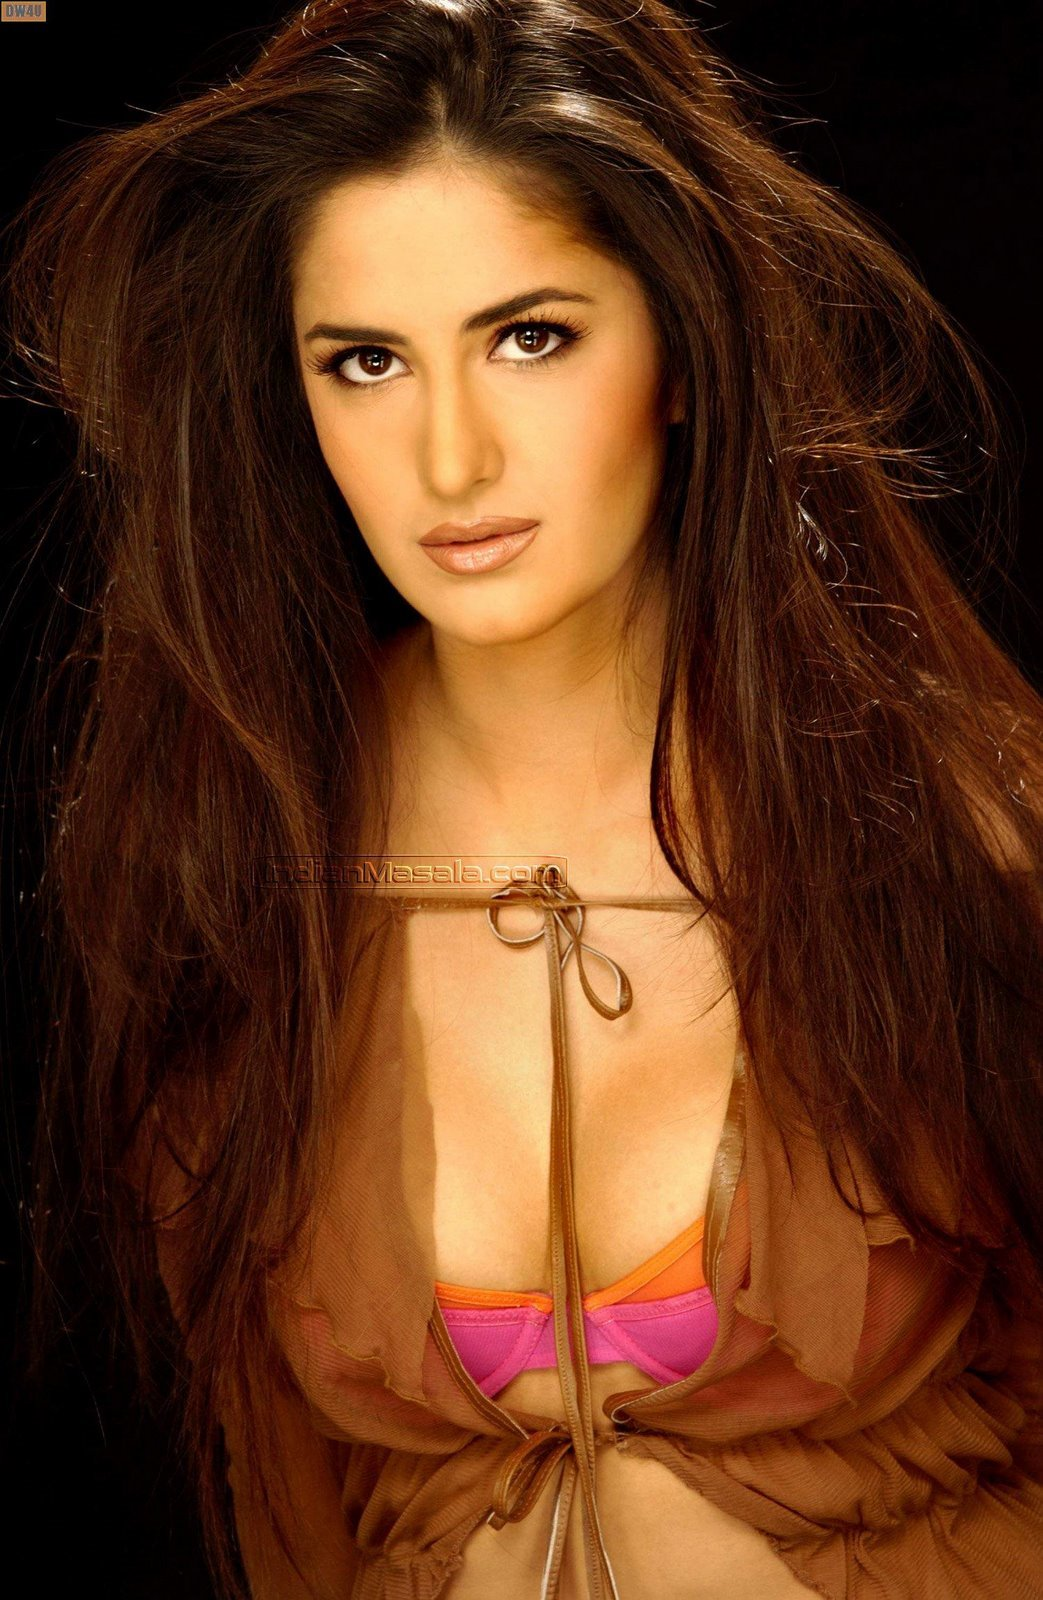 Hot Indian Actress Rare HQ Photos: Hottest Bollywood